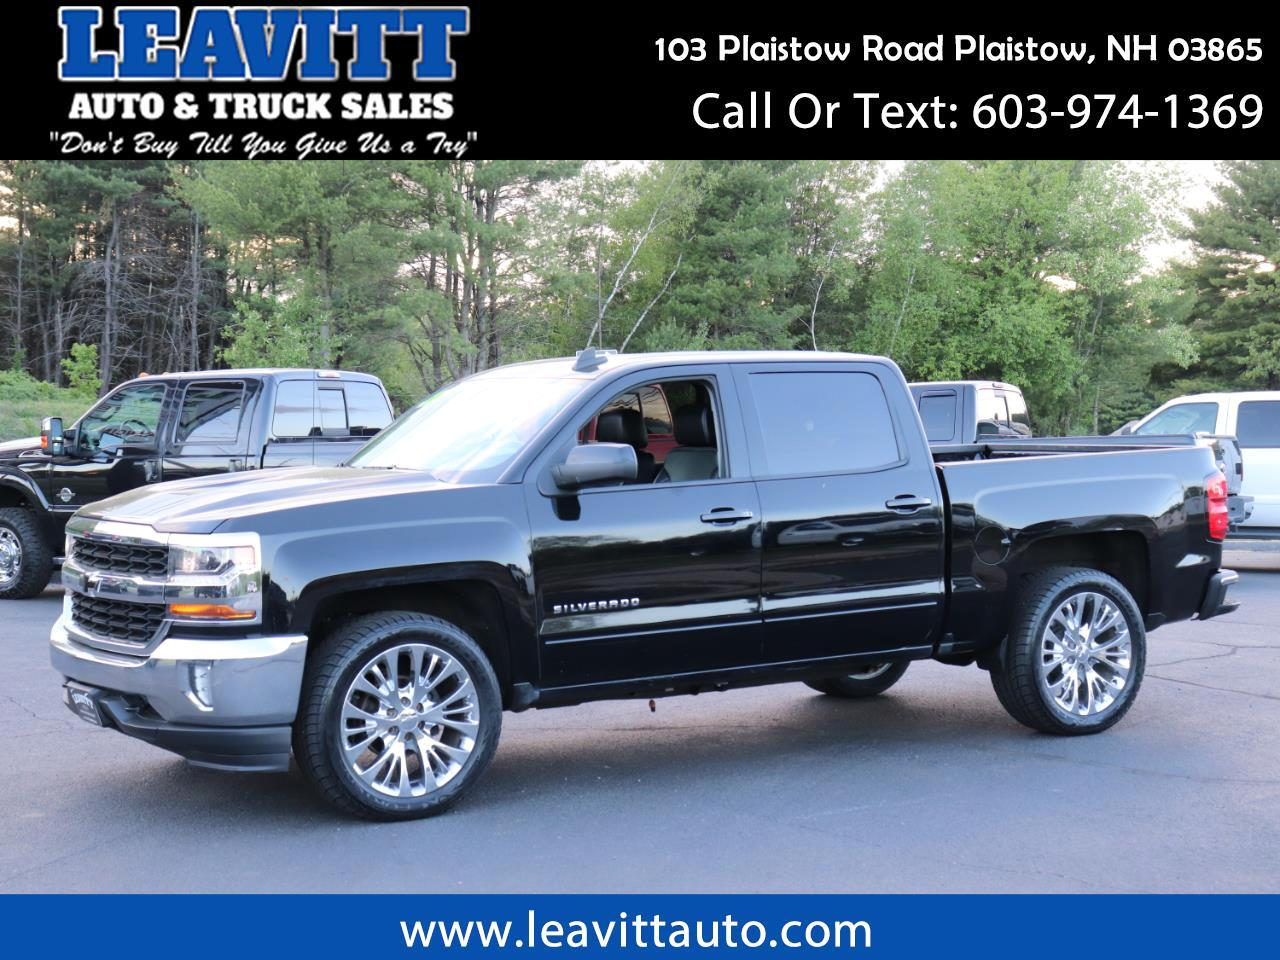 Used 2017 Chevrolet Silverado 1500 Lt Crew Cab Black Black 22 Chrome Wheels For Sale In Plaistow Nh 03865 Leavitt Auto And Truck